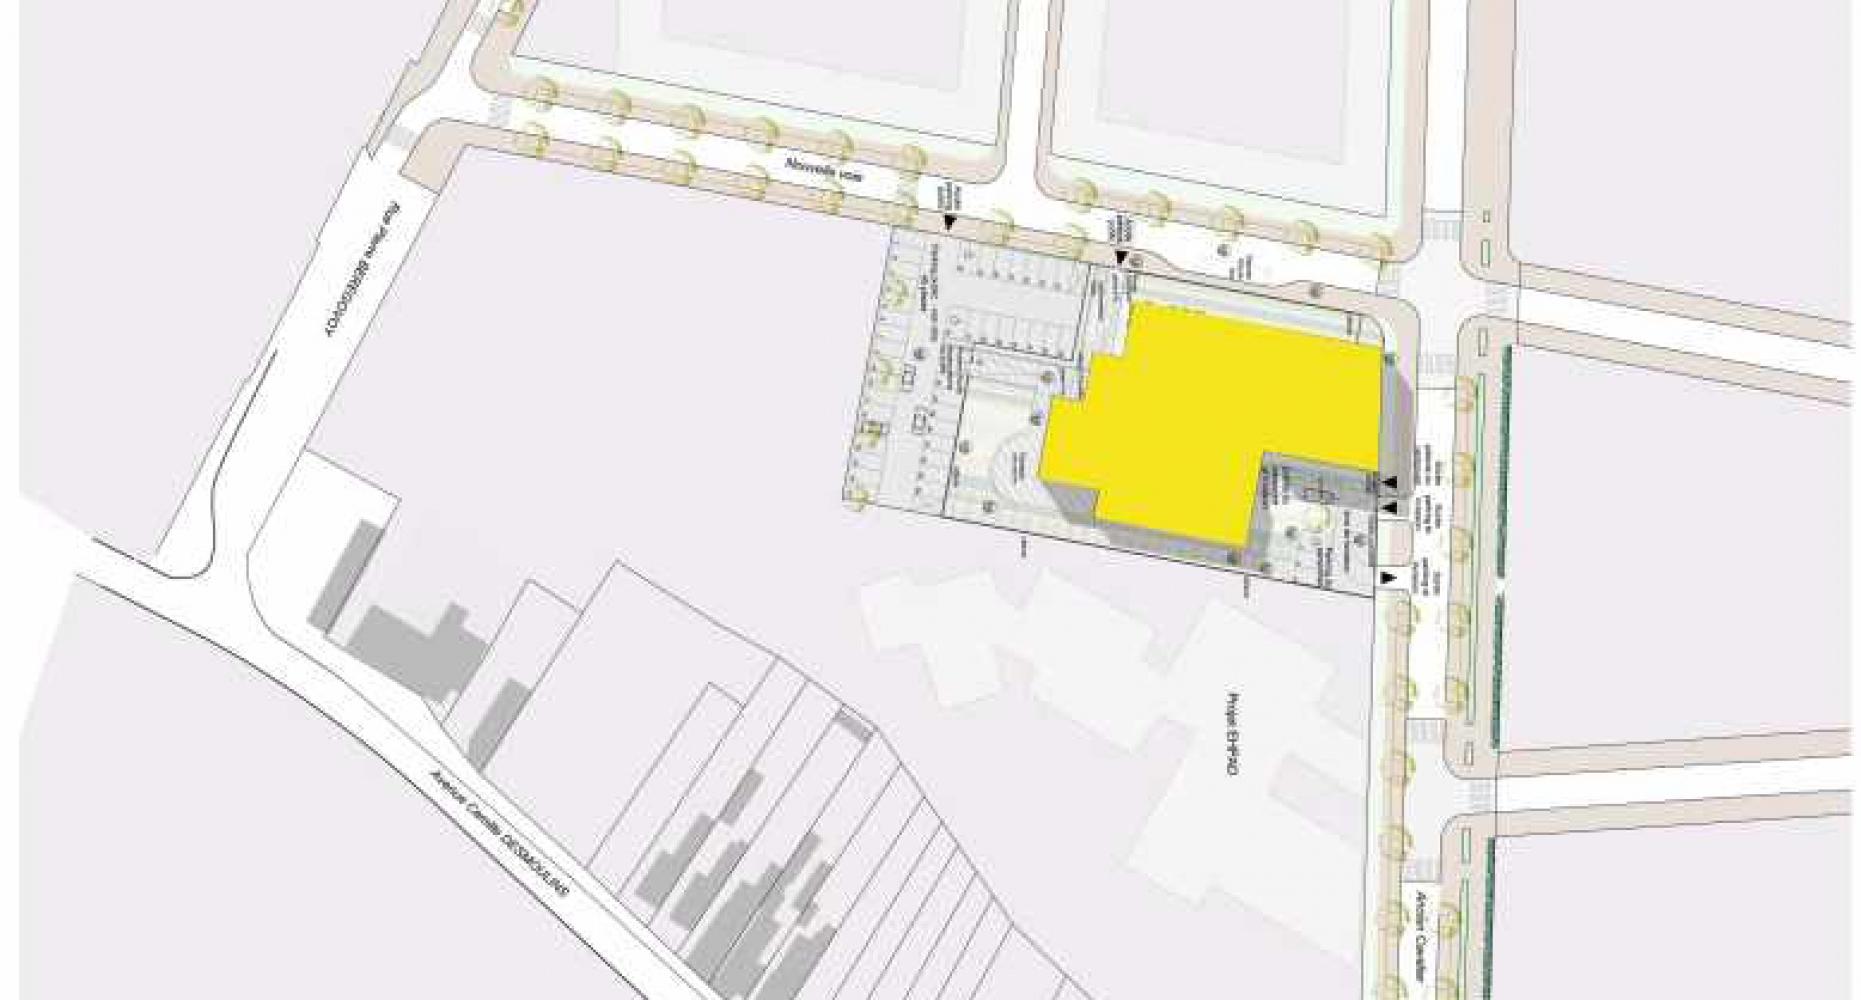 3-12-escaudain-img-002 Pascale SEURIN Architecte - Pascale SEURIN Architecte